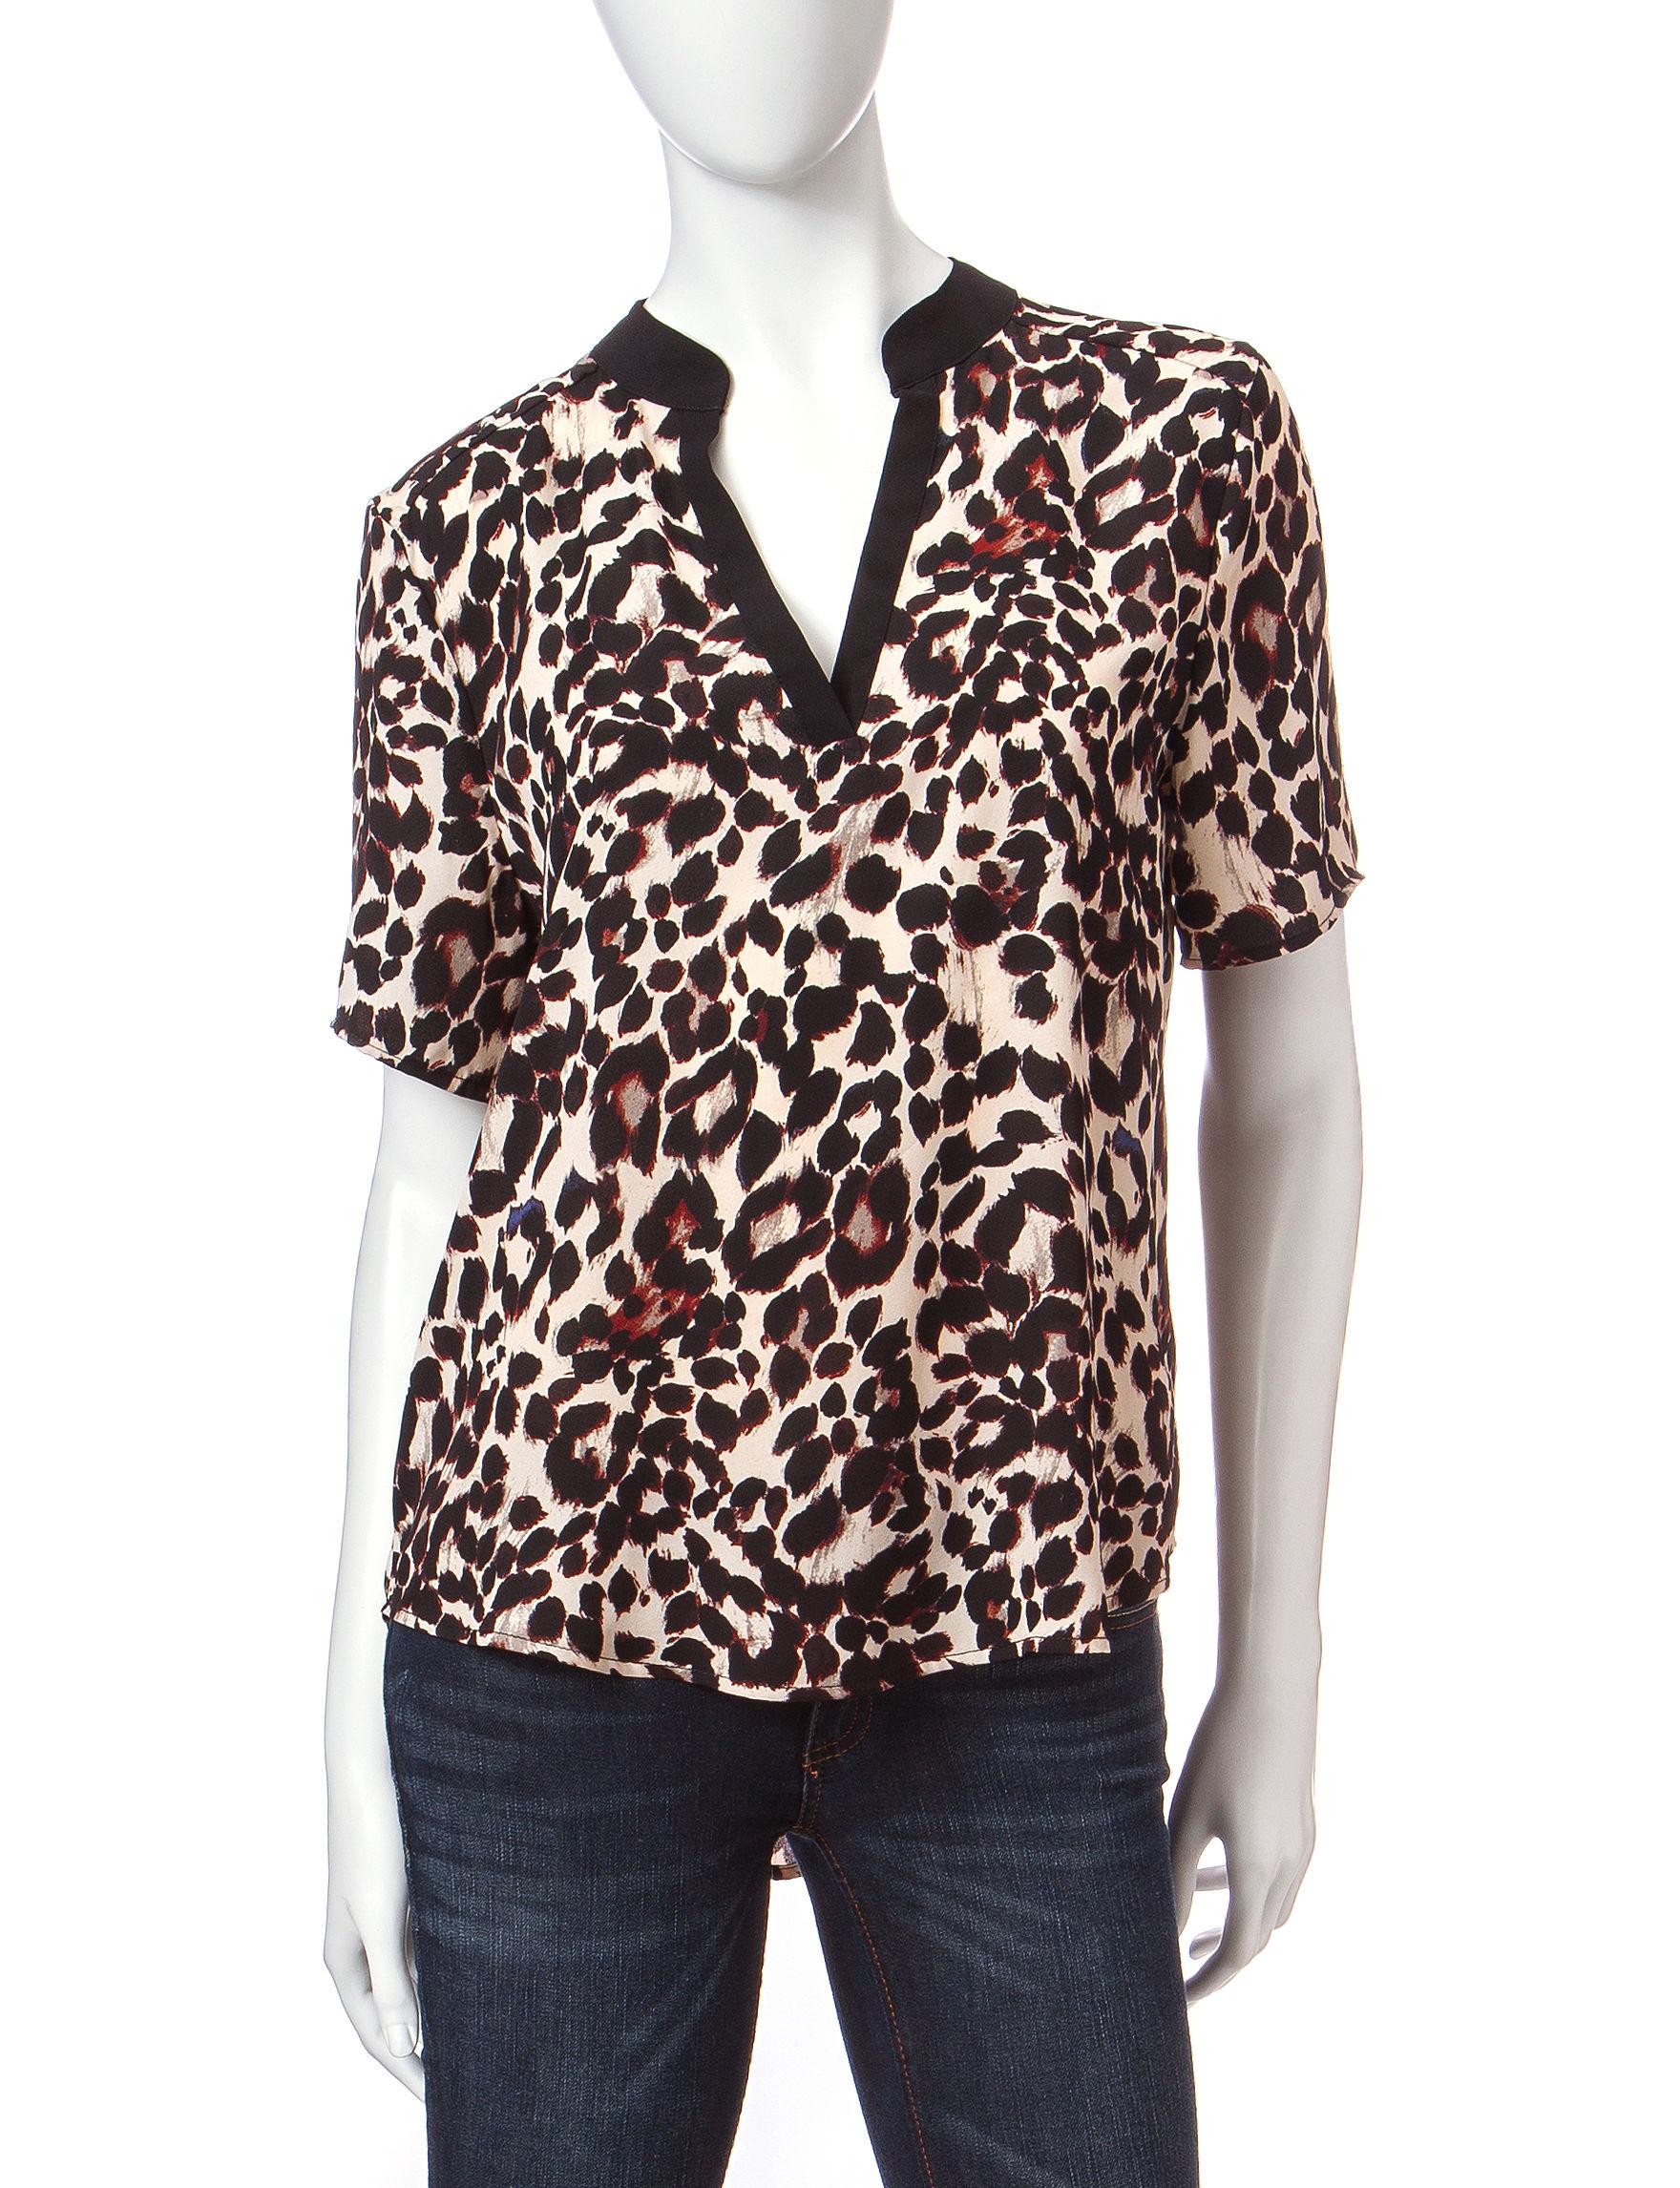 Wishful Park Cheetah Shirts & Blouses